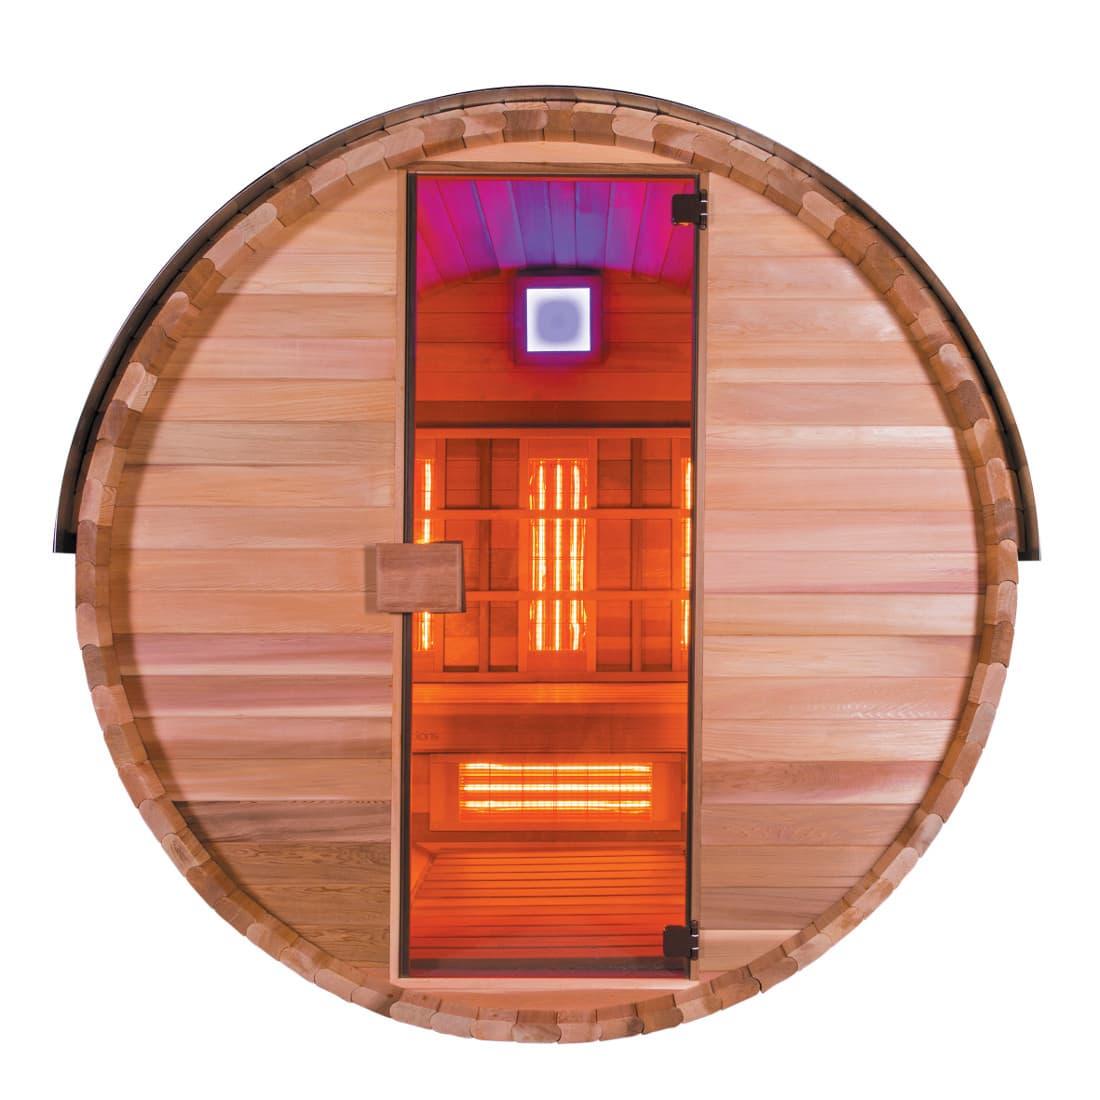 sauna infrarouge barrel ir 3pl sauna d 39 ext rieur infrarouge barrel ir 3 places l 150 x. Black Bedroom Furniture Sets. Home Design Ideas